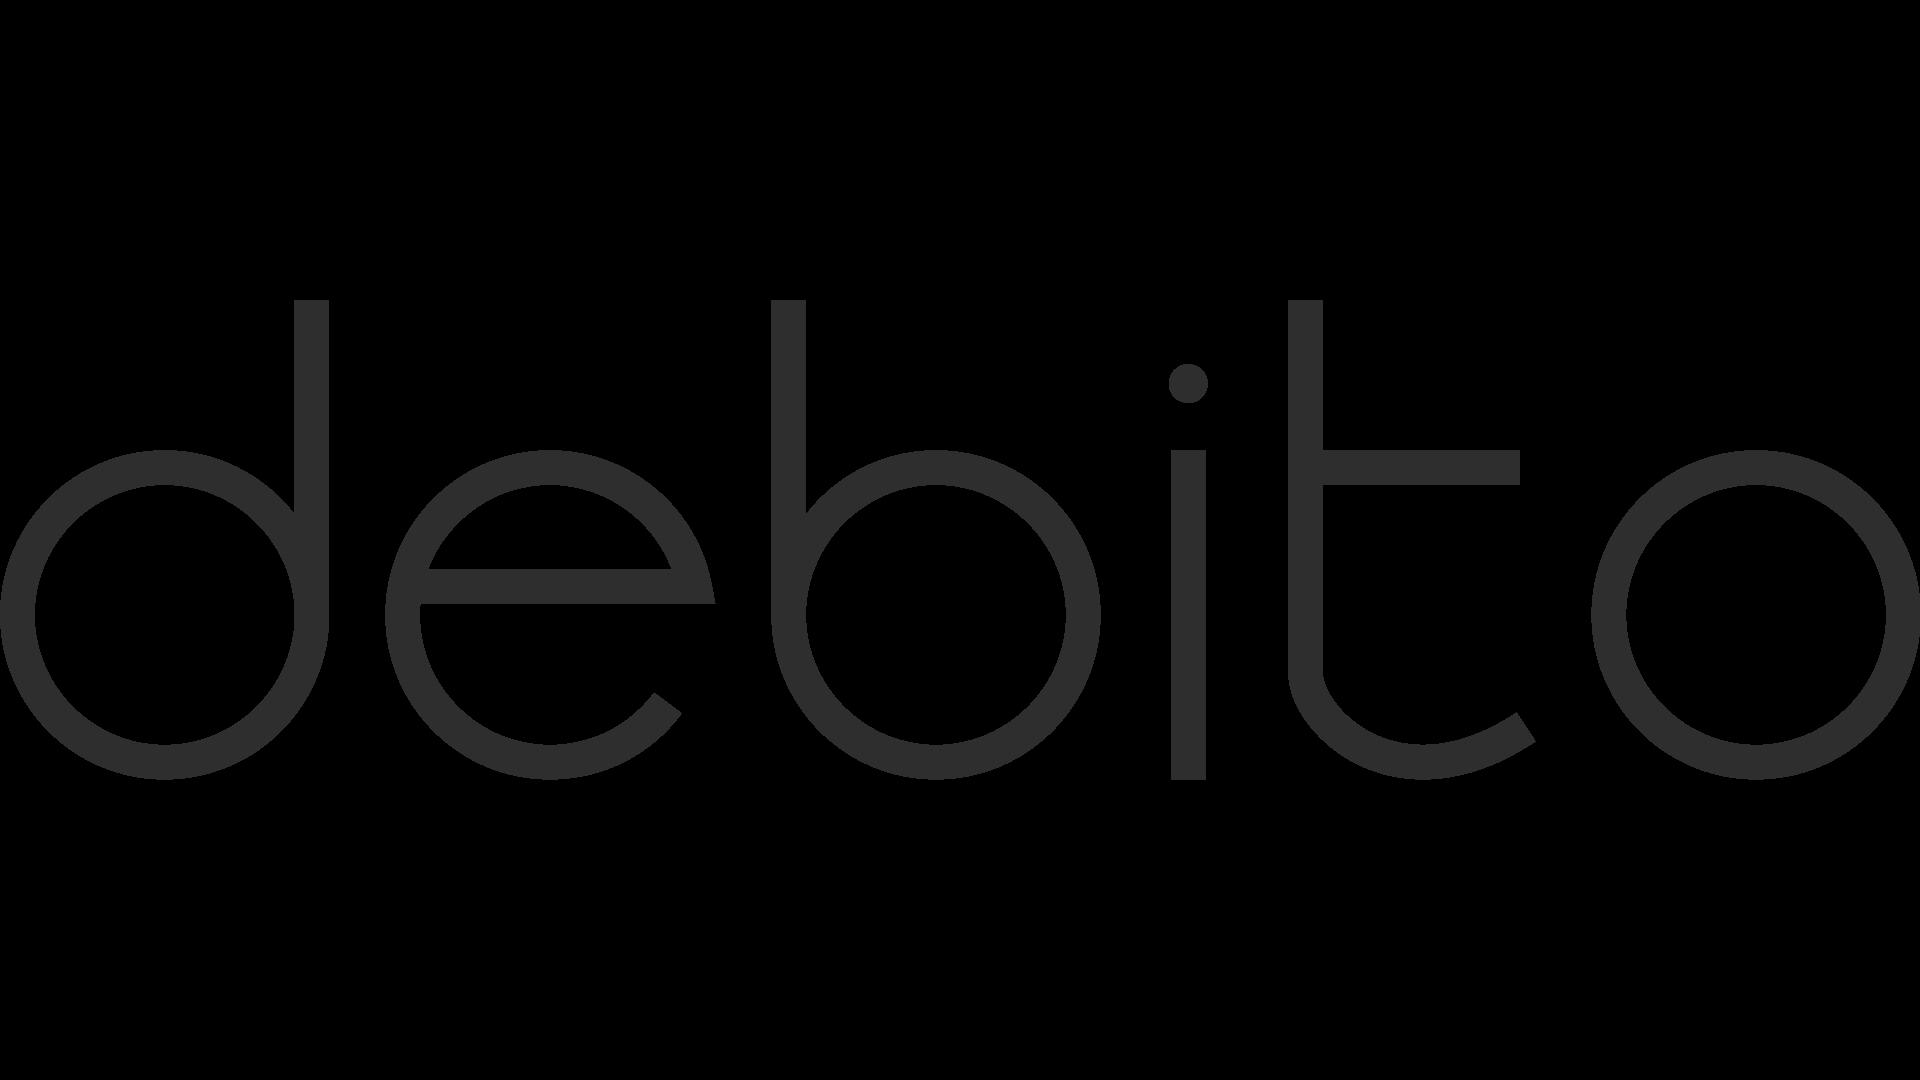 debito-logo-PNG